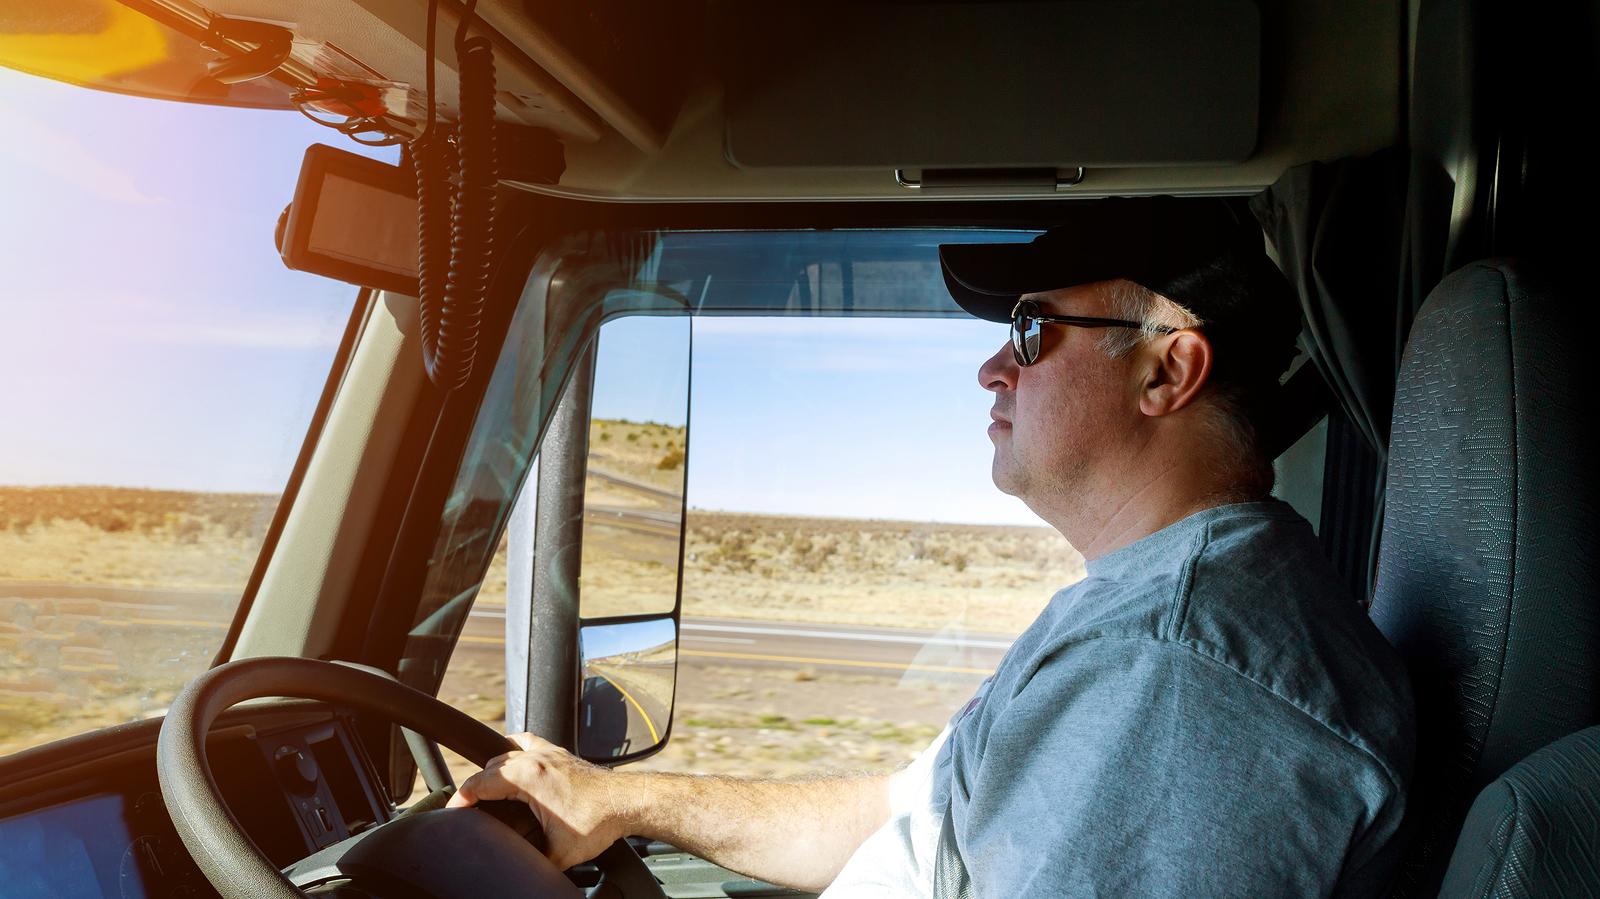 A driver working despite truck driver turnover.